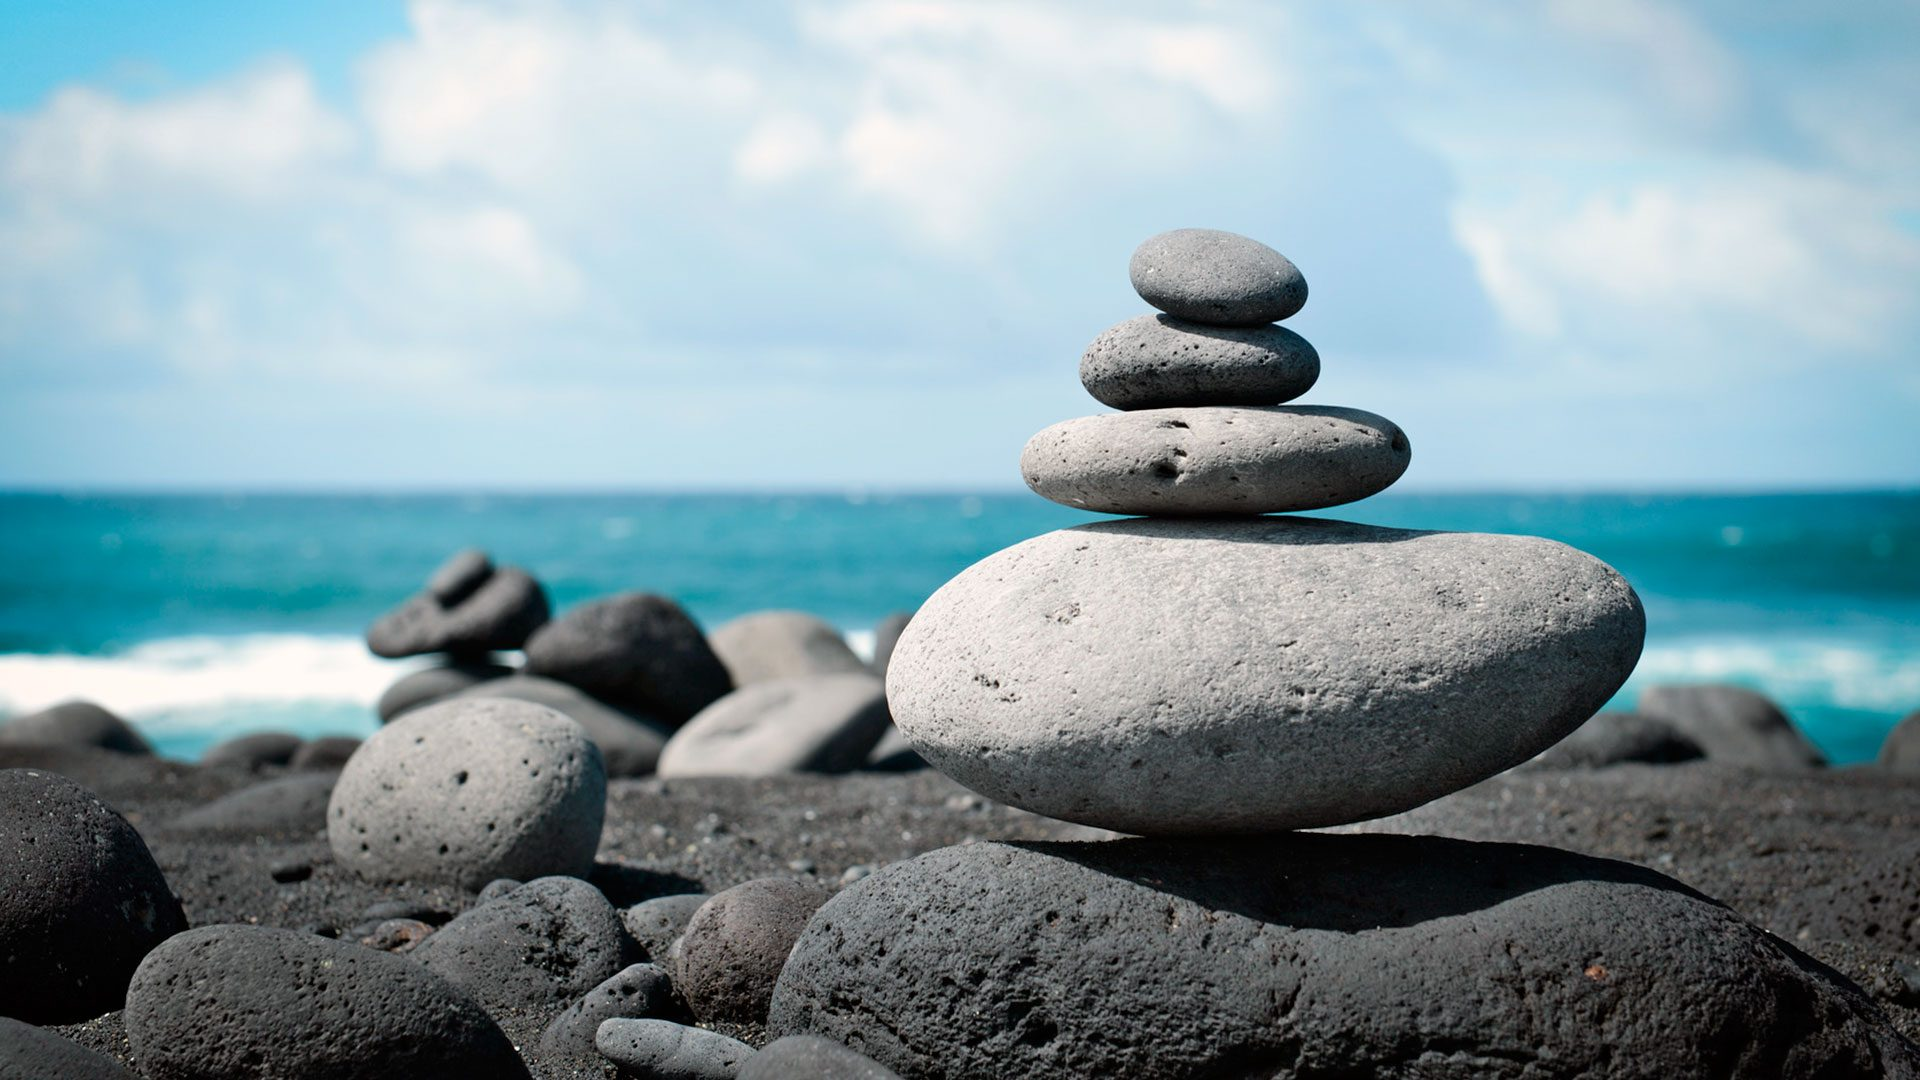 image balancing life